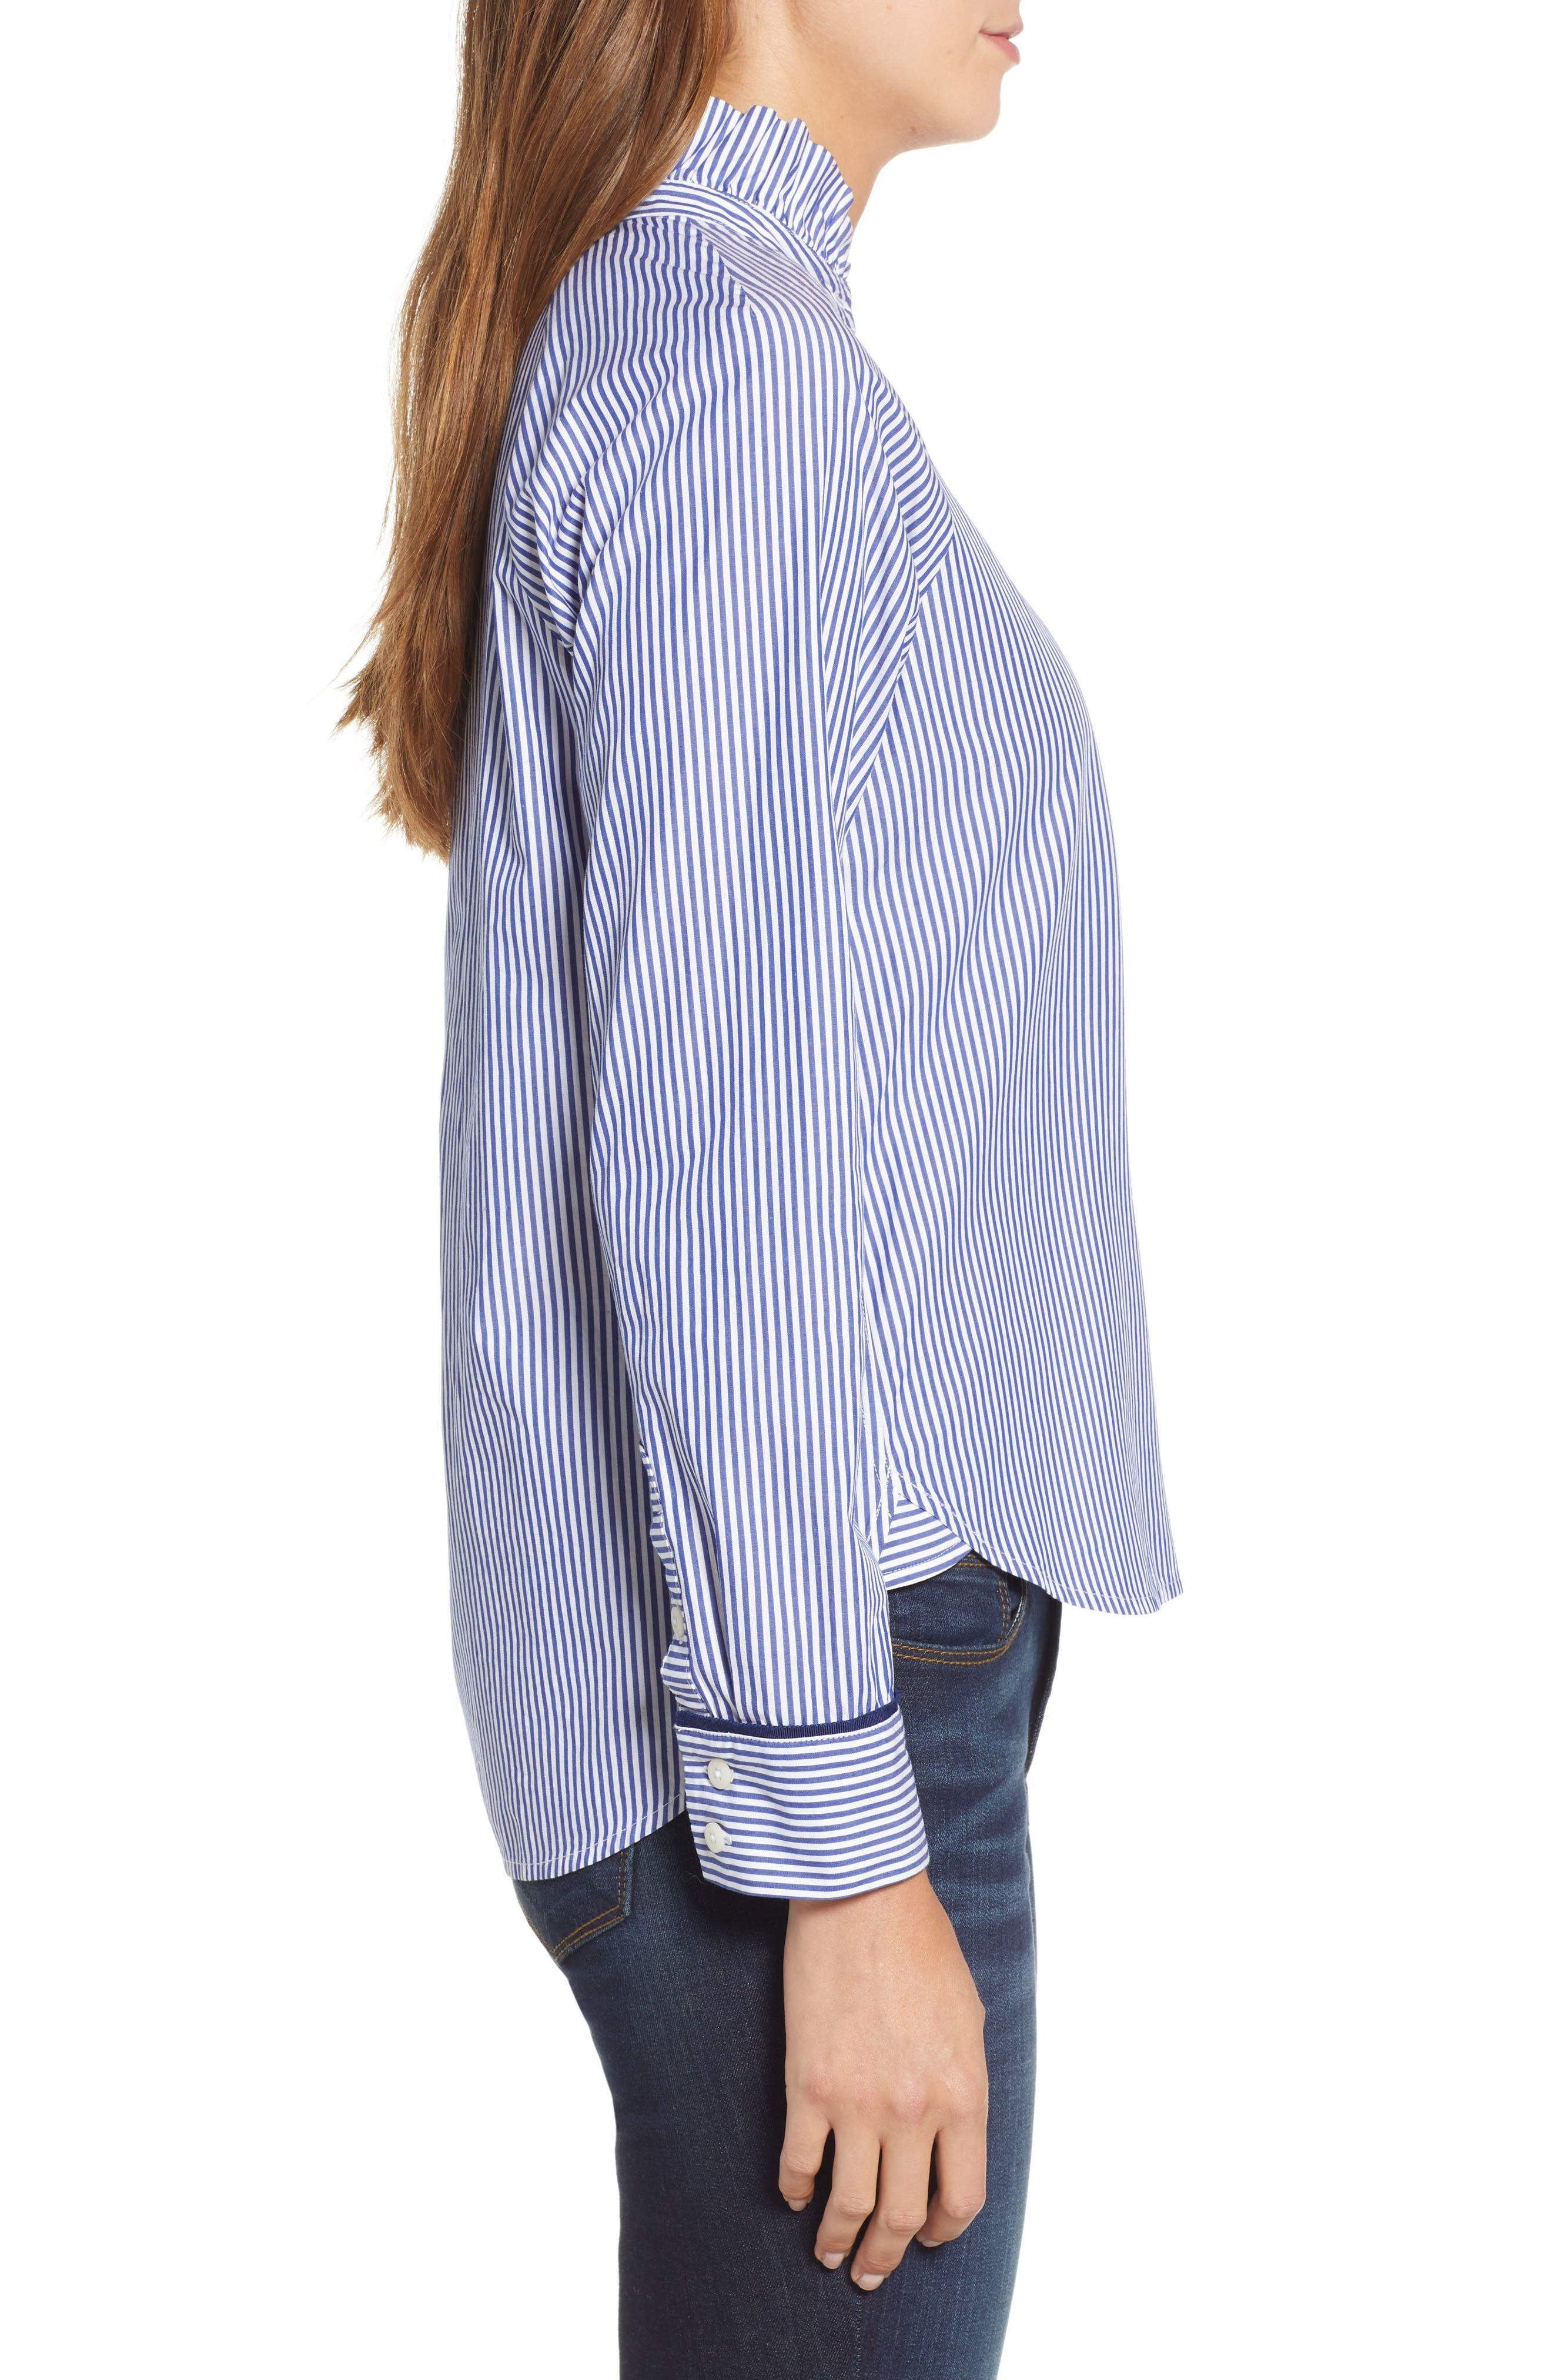 VINEYARD VINES,                             Stripe Ruffle Shirt,                             Alternate thumbnail 3, color,                             474